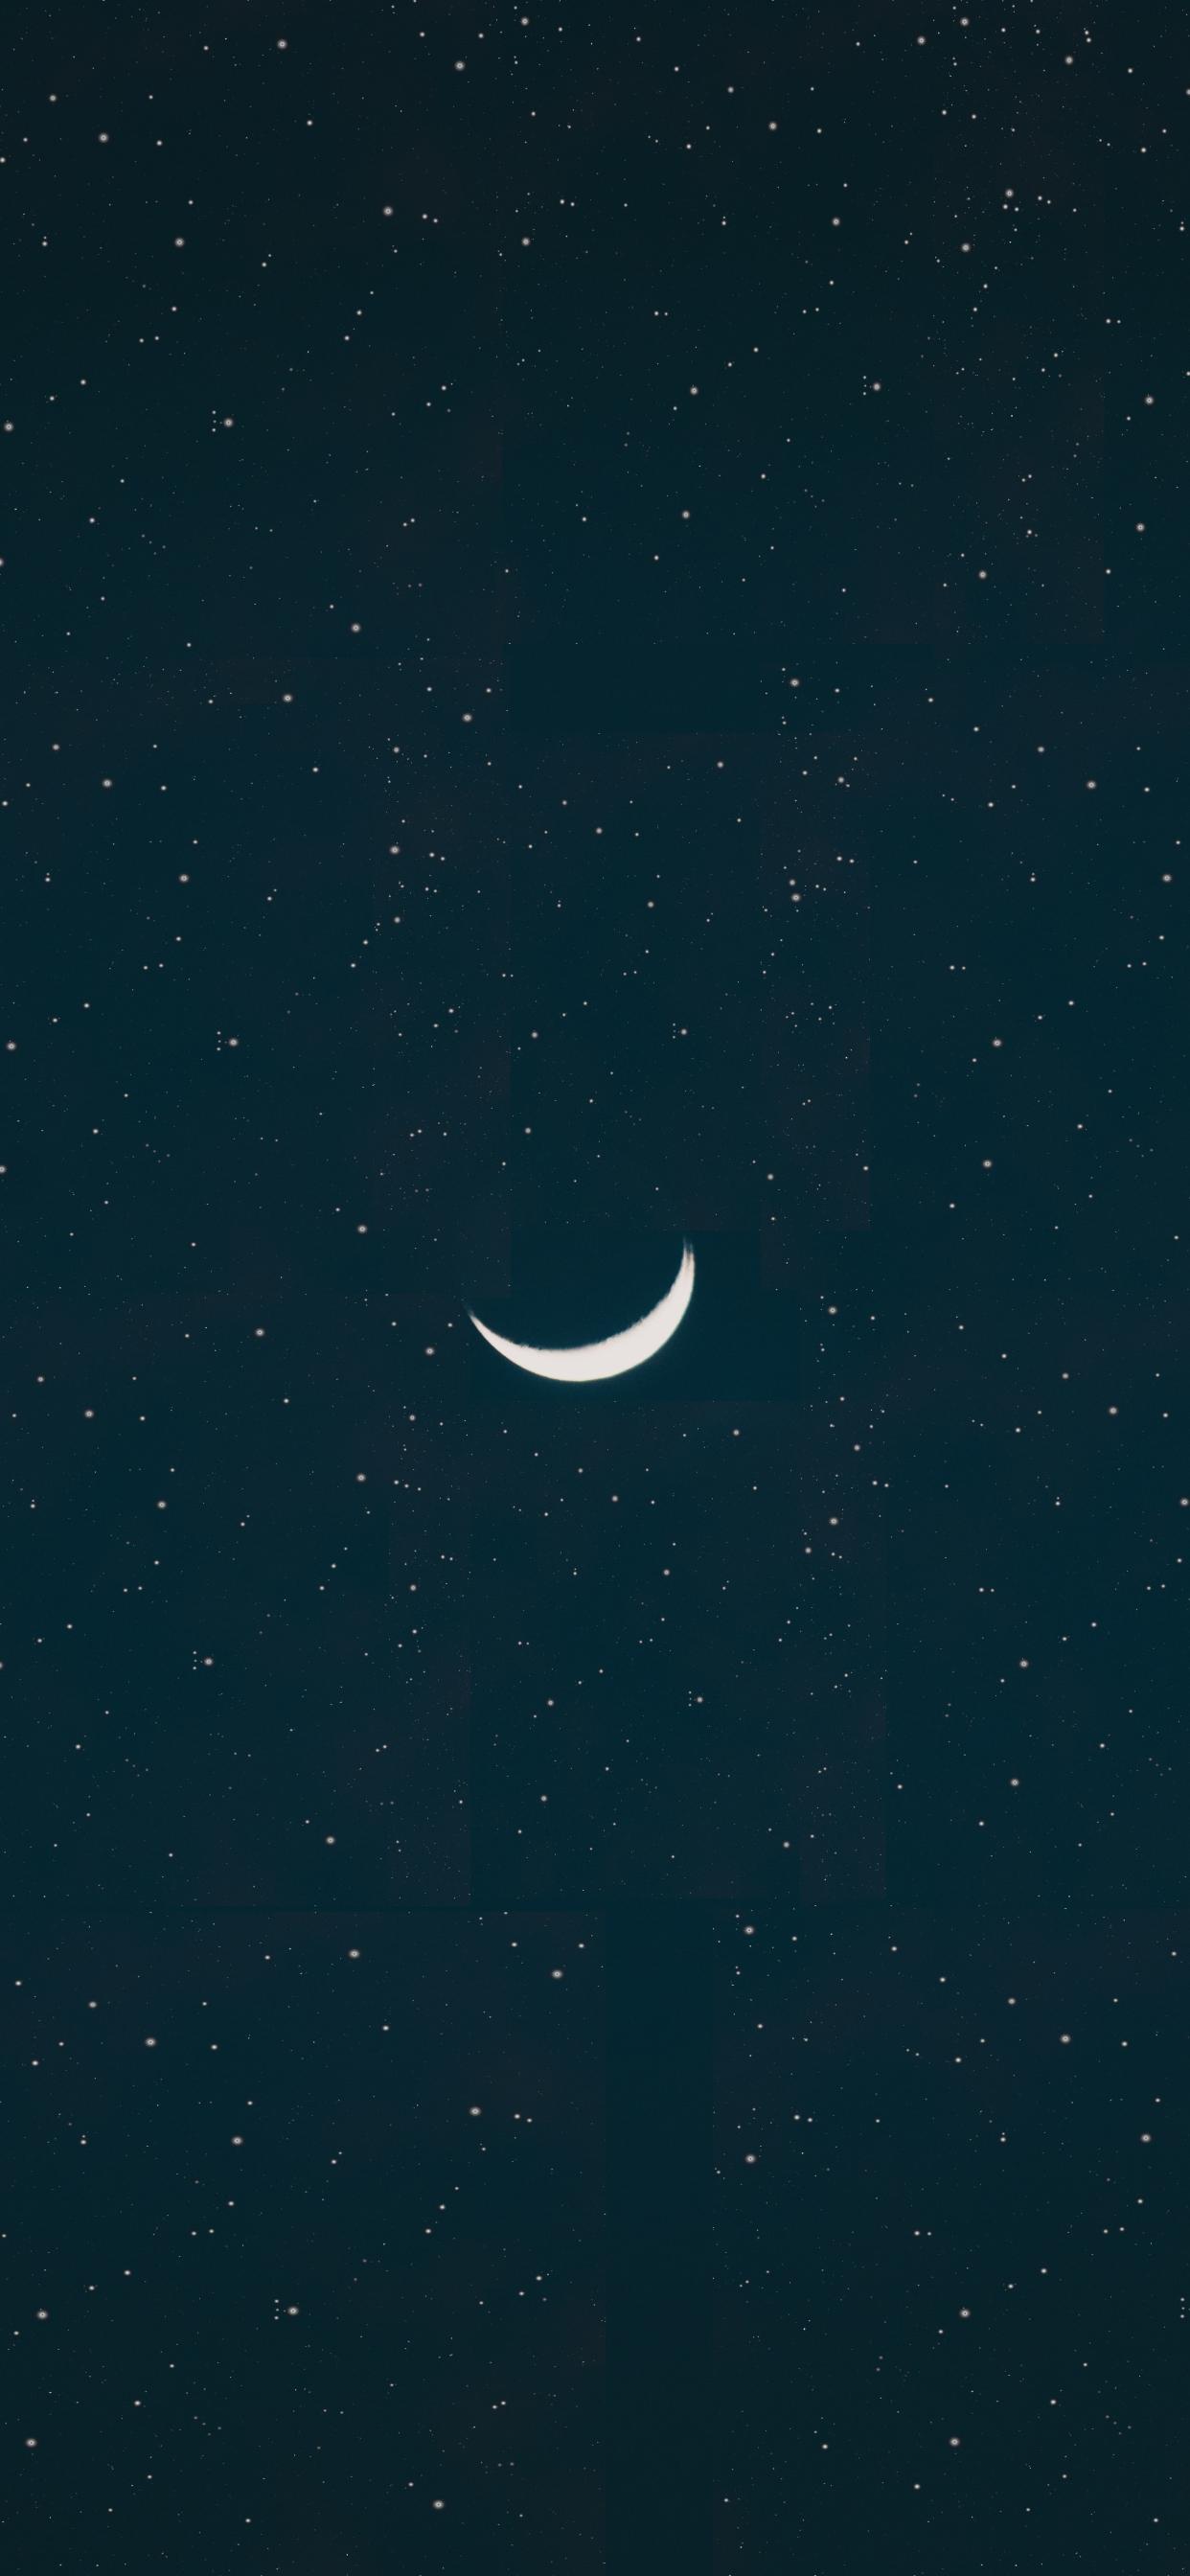 Iphone Xs Moon Wallpaper 21k   Rehare